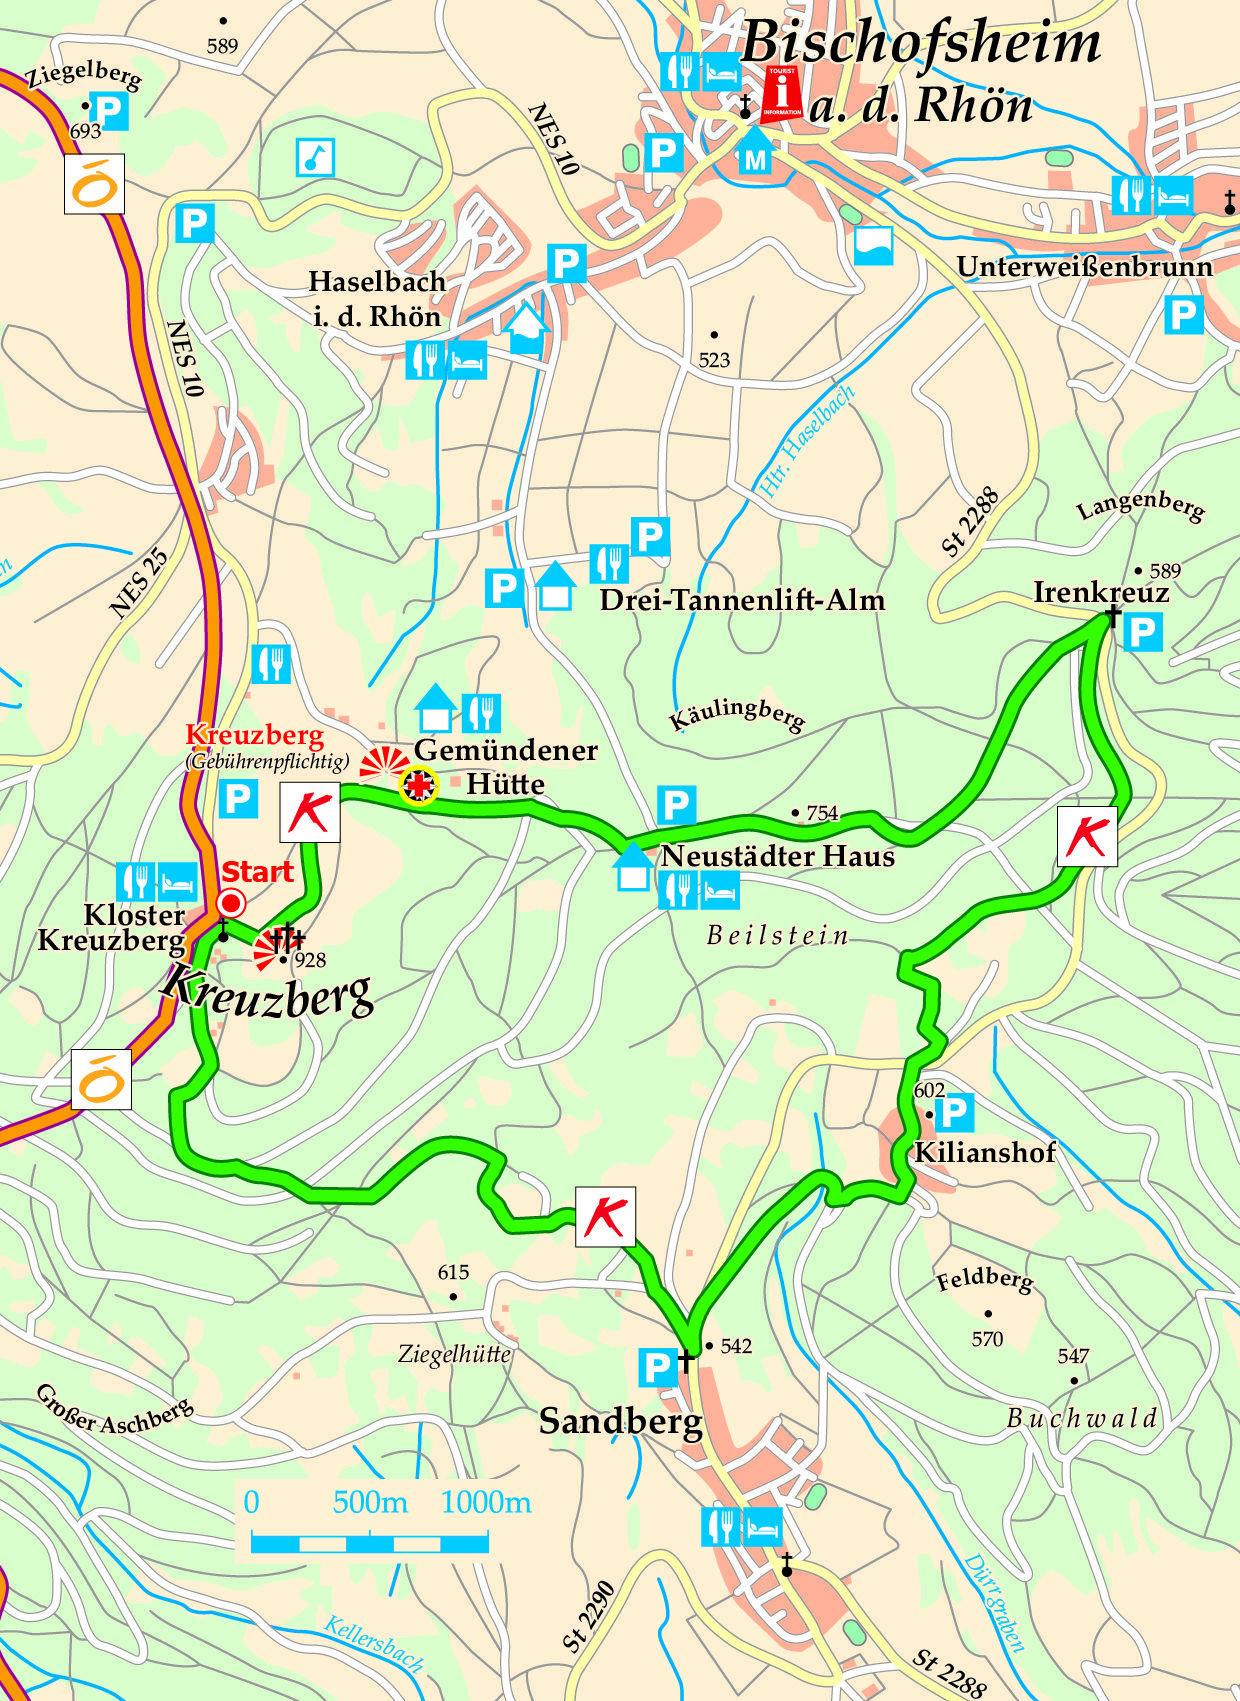 Extratour Kreuzbergtour Karte Wandern Deutschland Erkunden Wandern